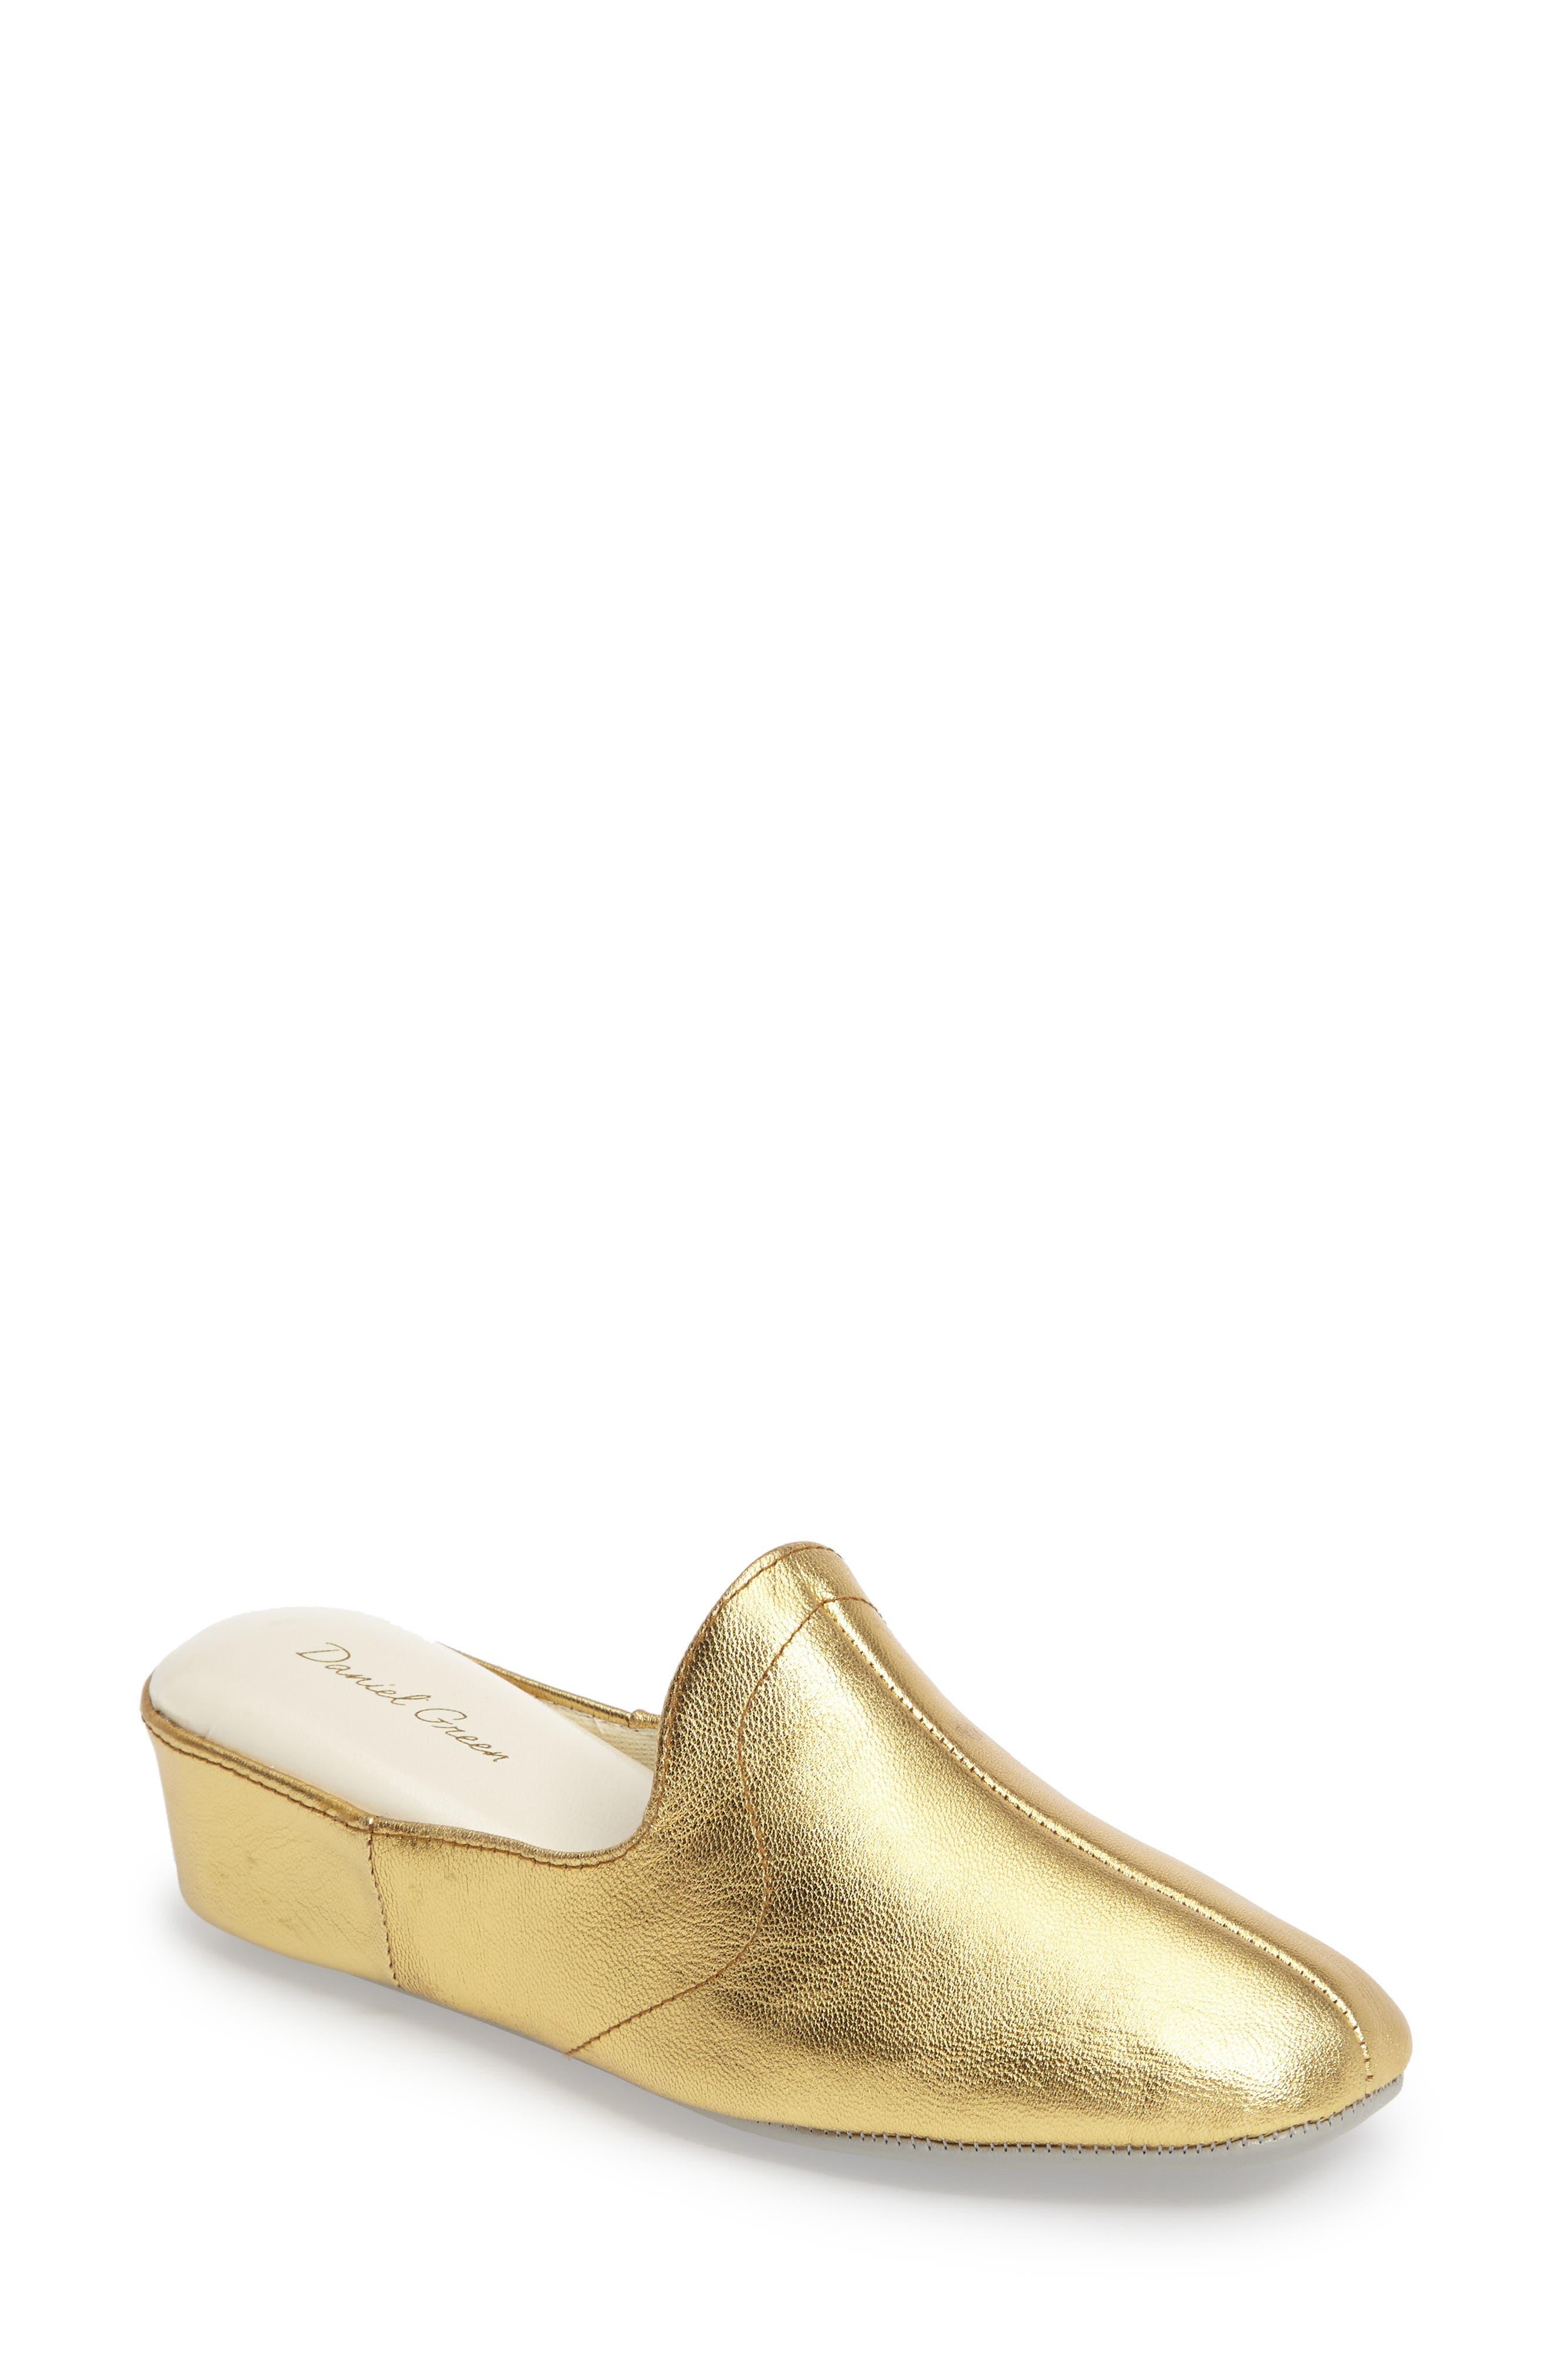 Glamour Scuff Slipper,                         Main,                         color, Gold Leather